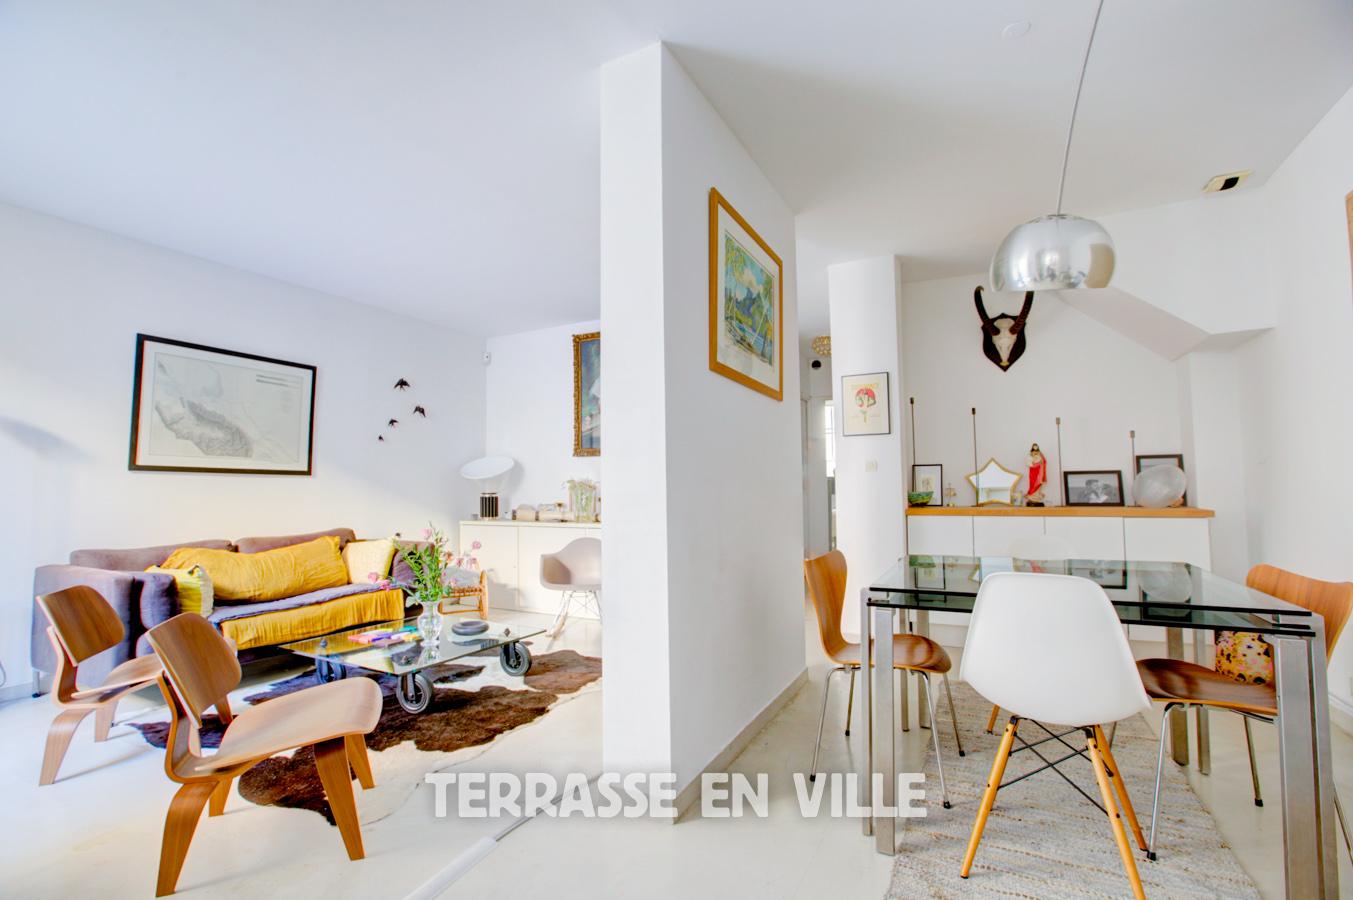 terrasse-14.jpg